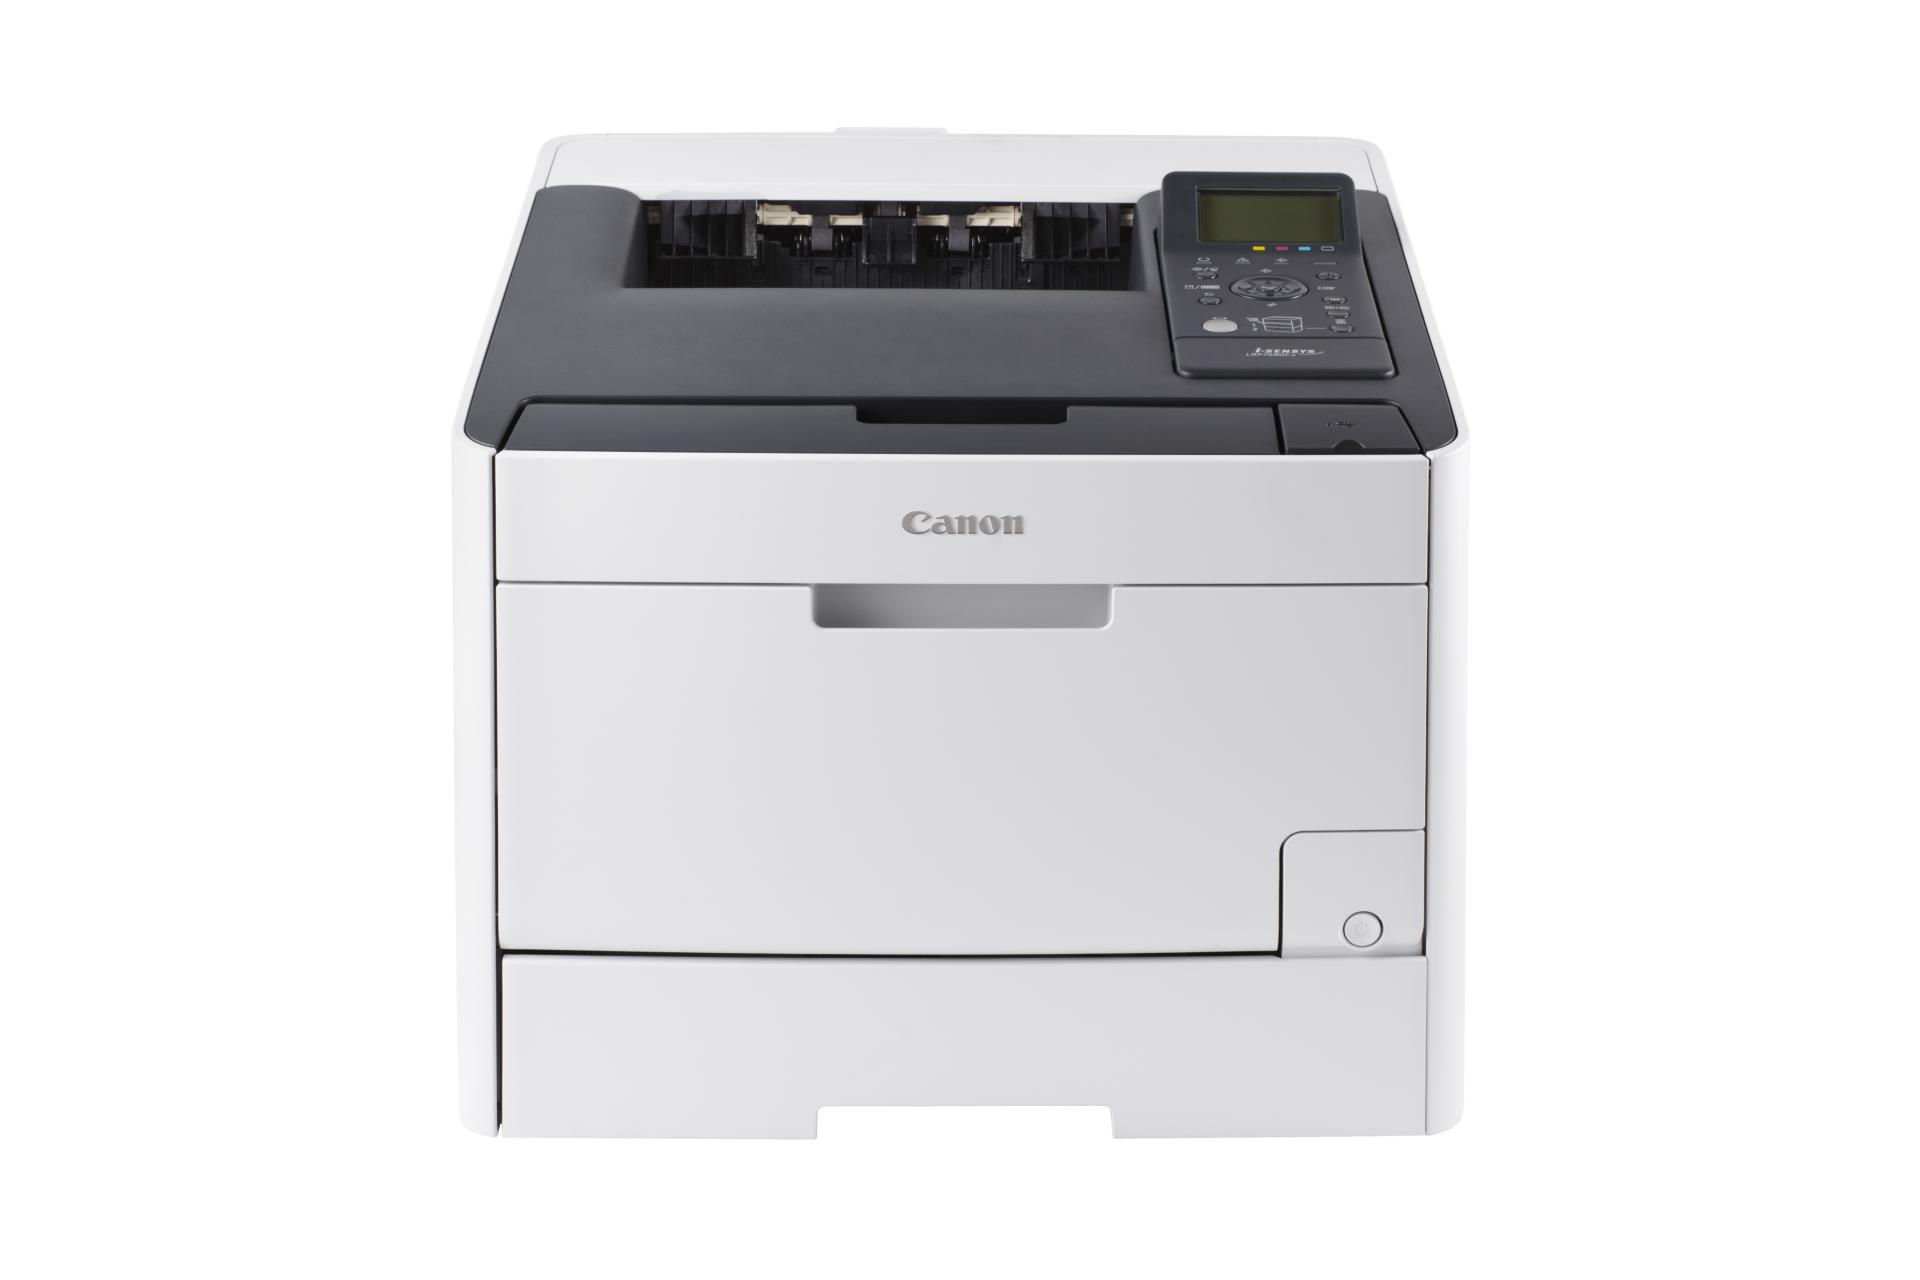 Canon i-SENSYS LBP-7680CX printeris